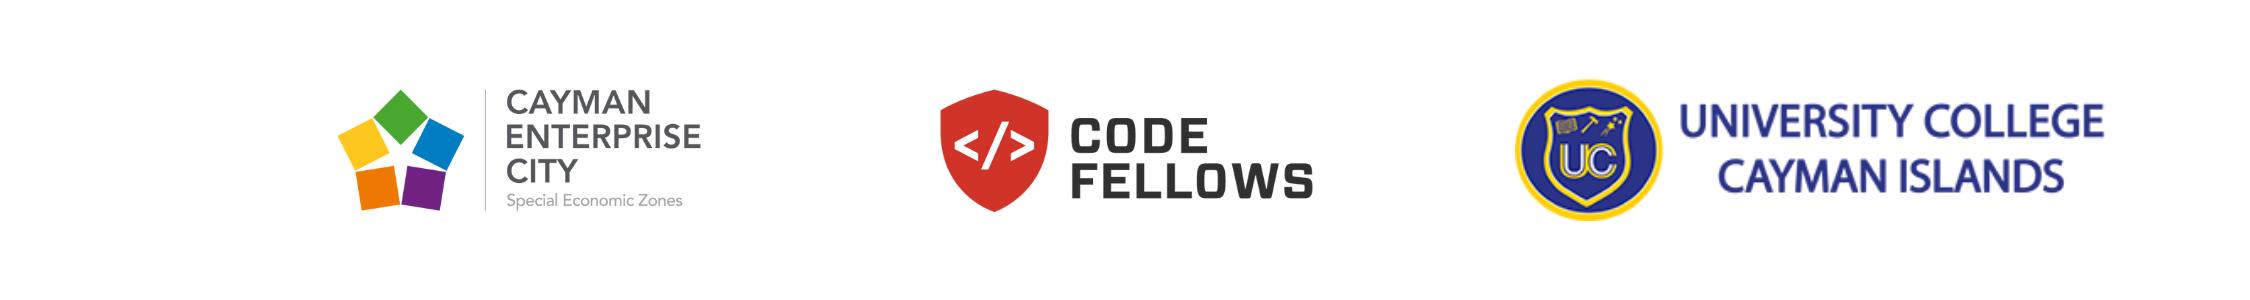 Cayman Code Academy sponsor logos